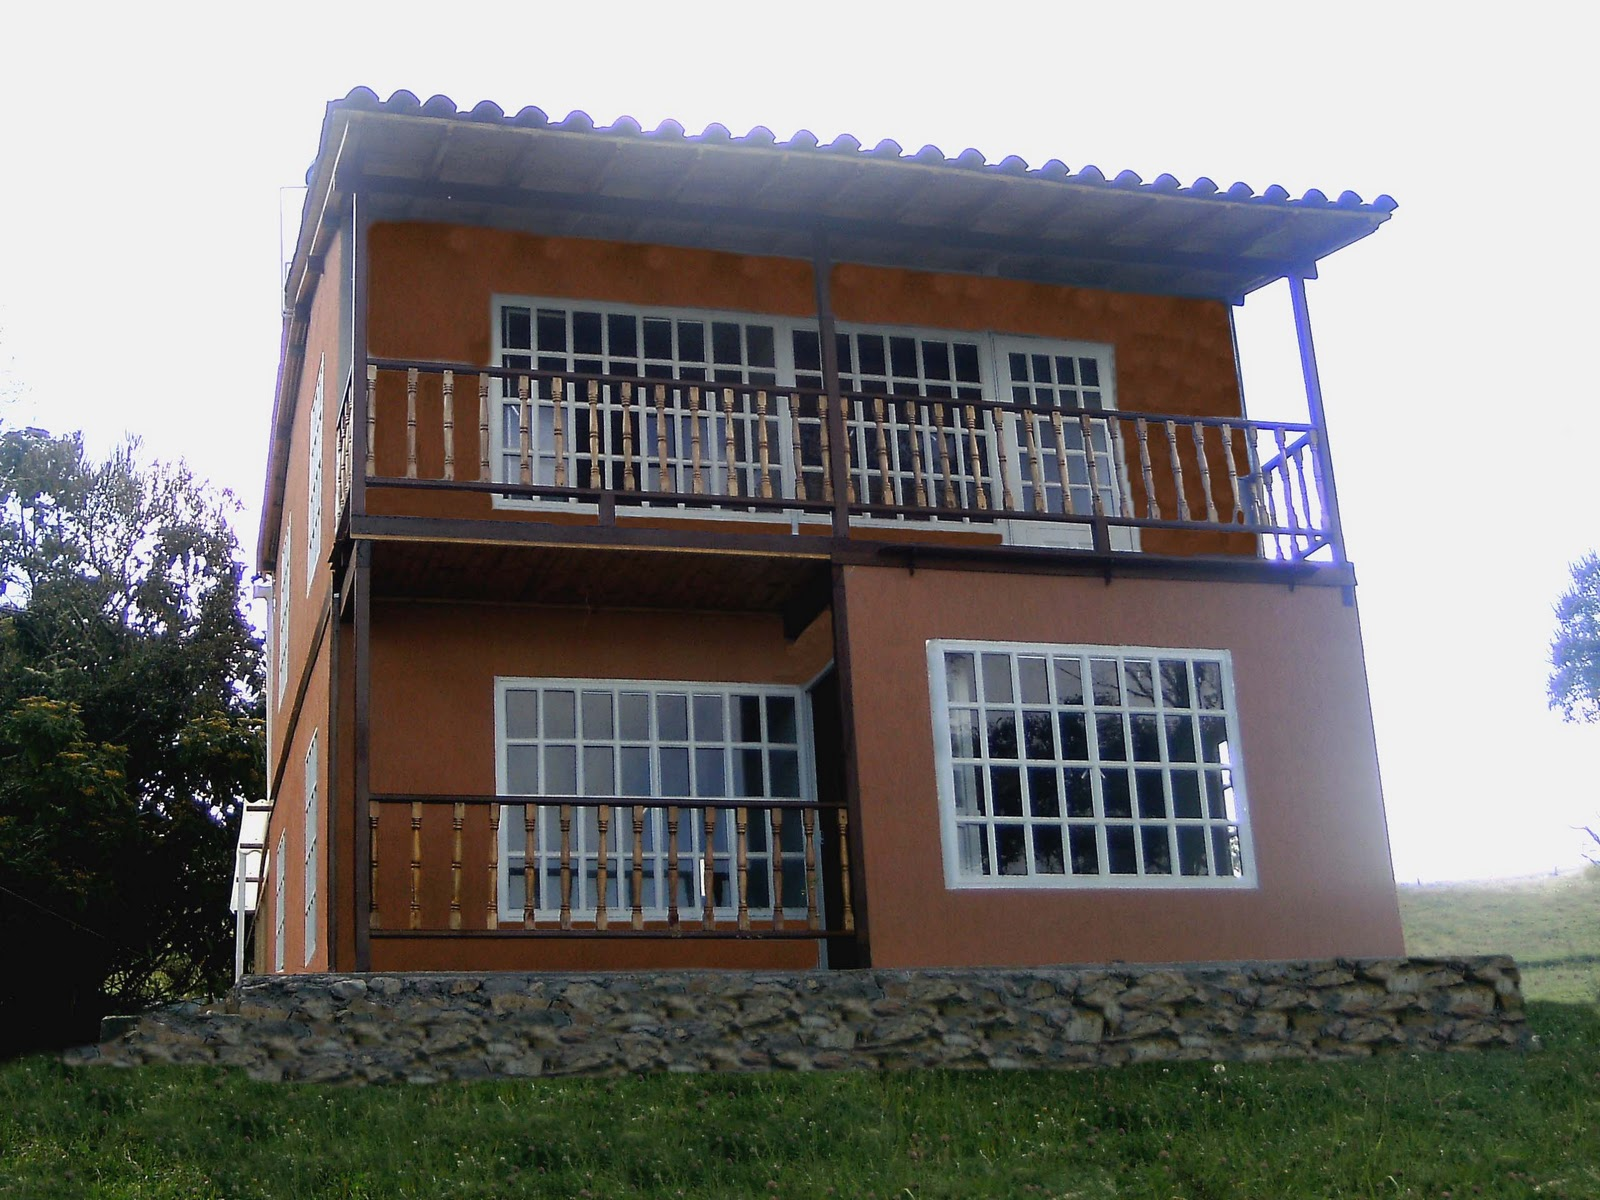 Casas prefabricados casas prefabricadas - Mejores casas prefabricadas ...